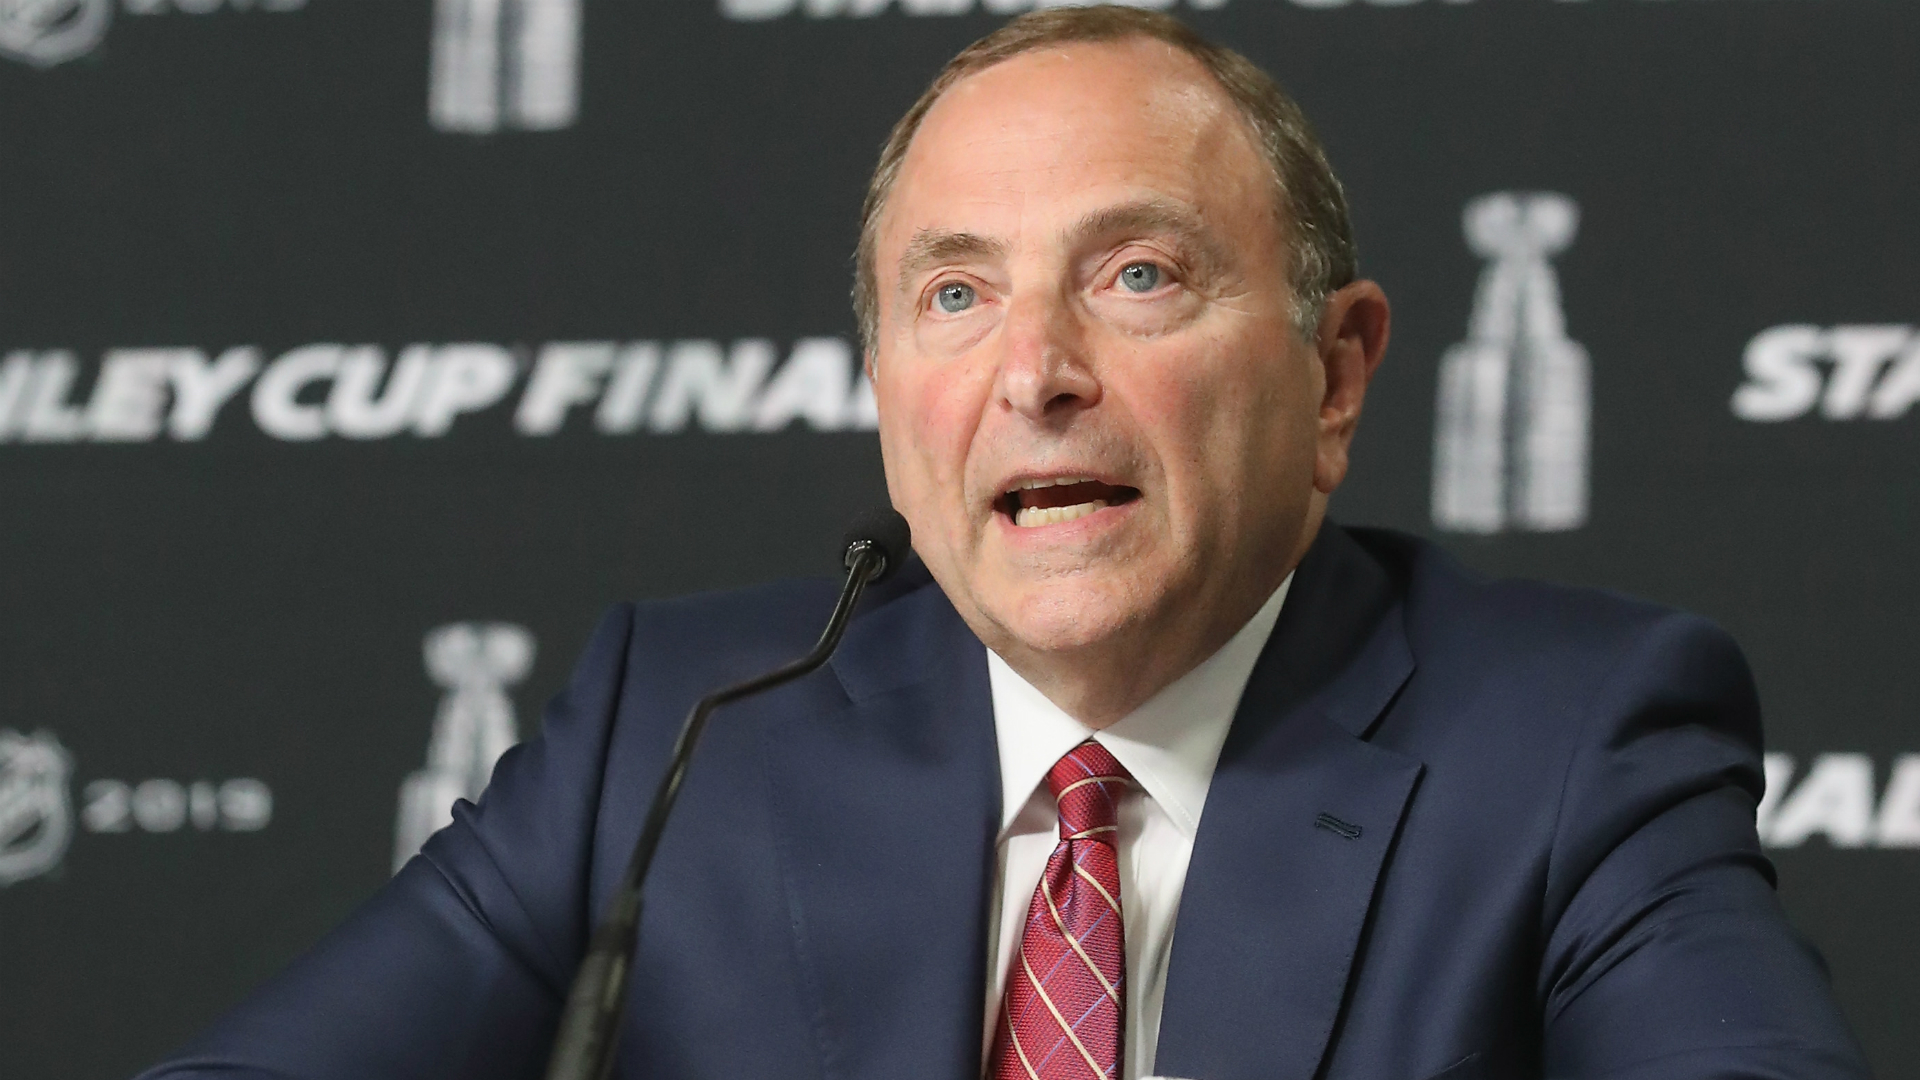 When will the 2021 NHL season start? Bettman says it's a 'work in progress'